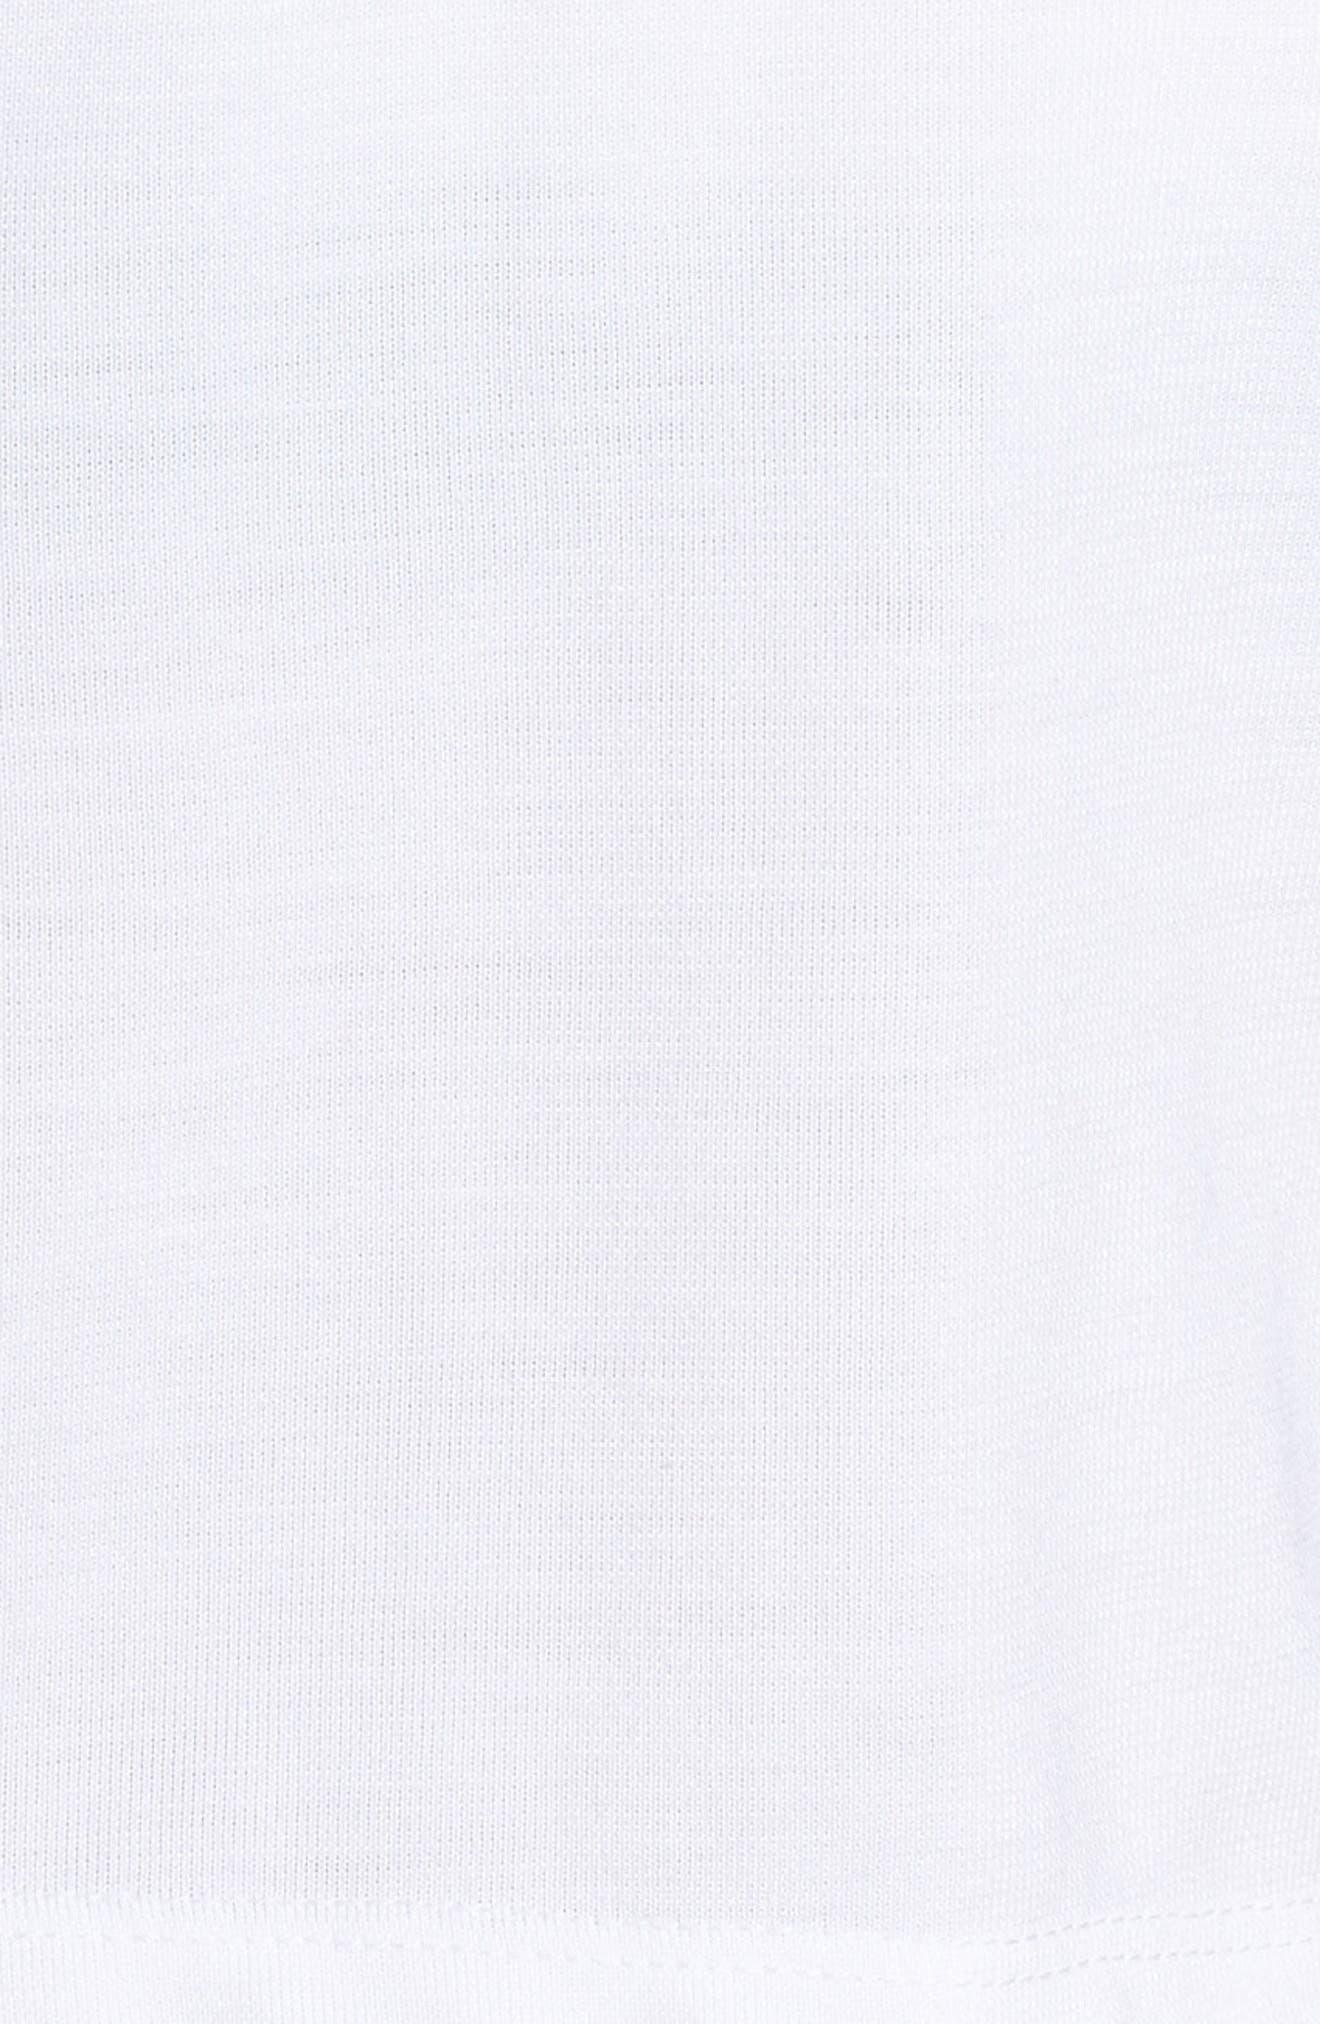 Sportswear Crop Top,                             Alternate thumbnail 6, color,                             WHITE/ BLACK